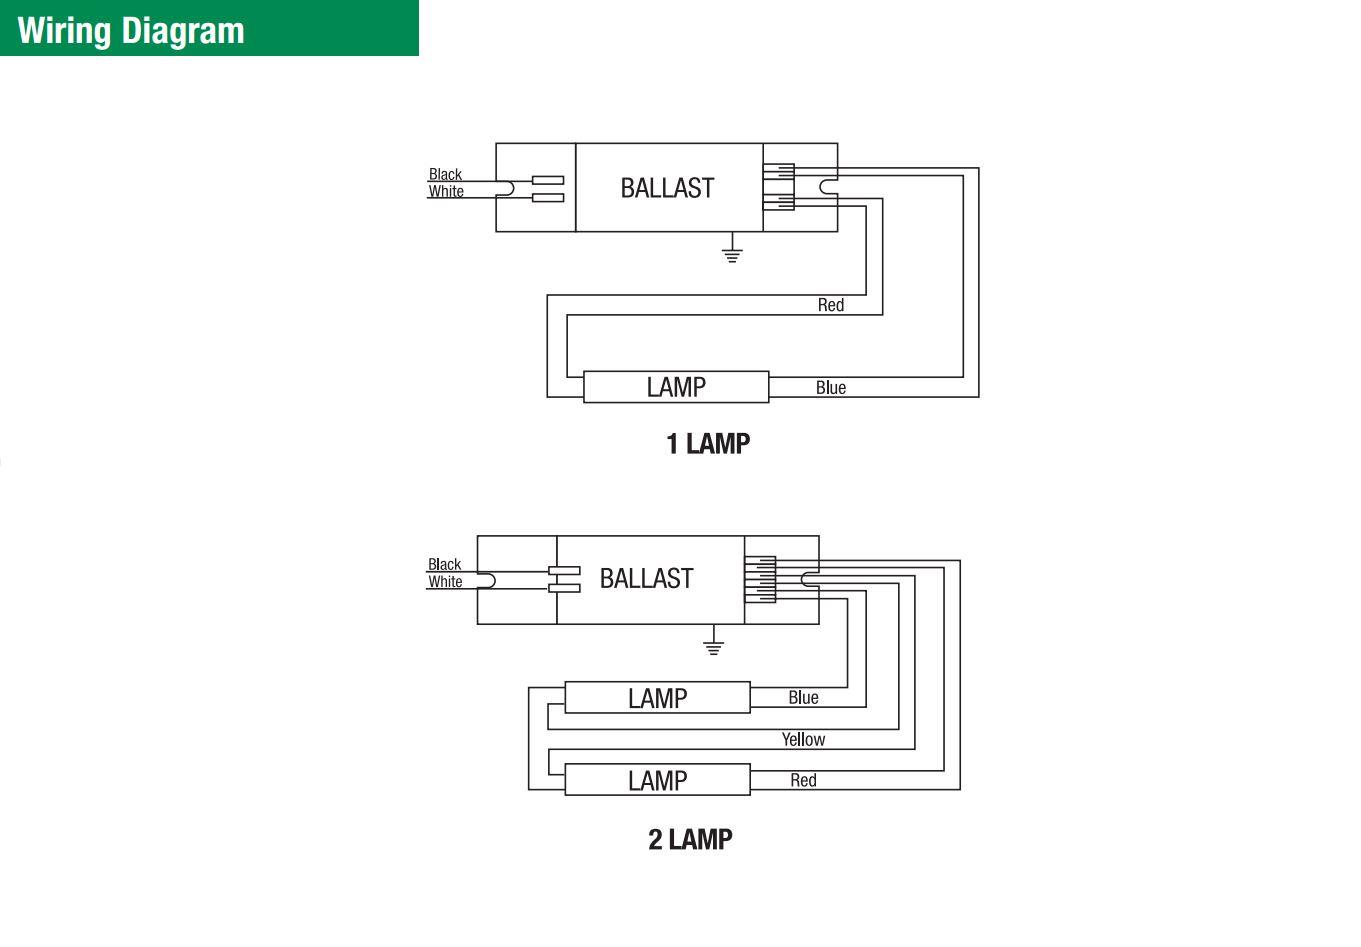 ipf wiring diagram amplifier kit radio shack luce 3tl 23 images